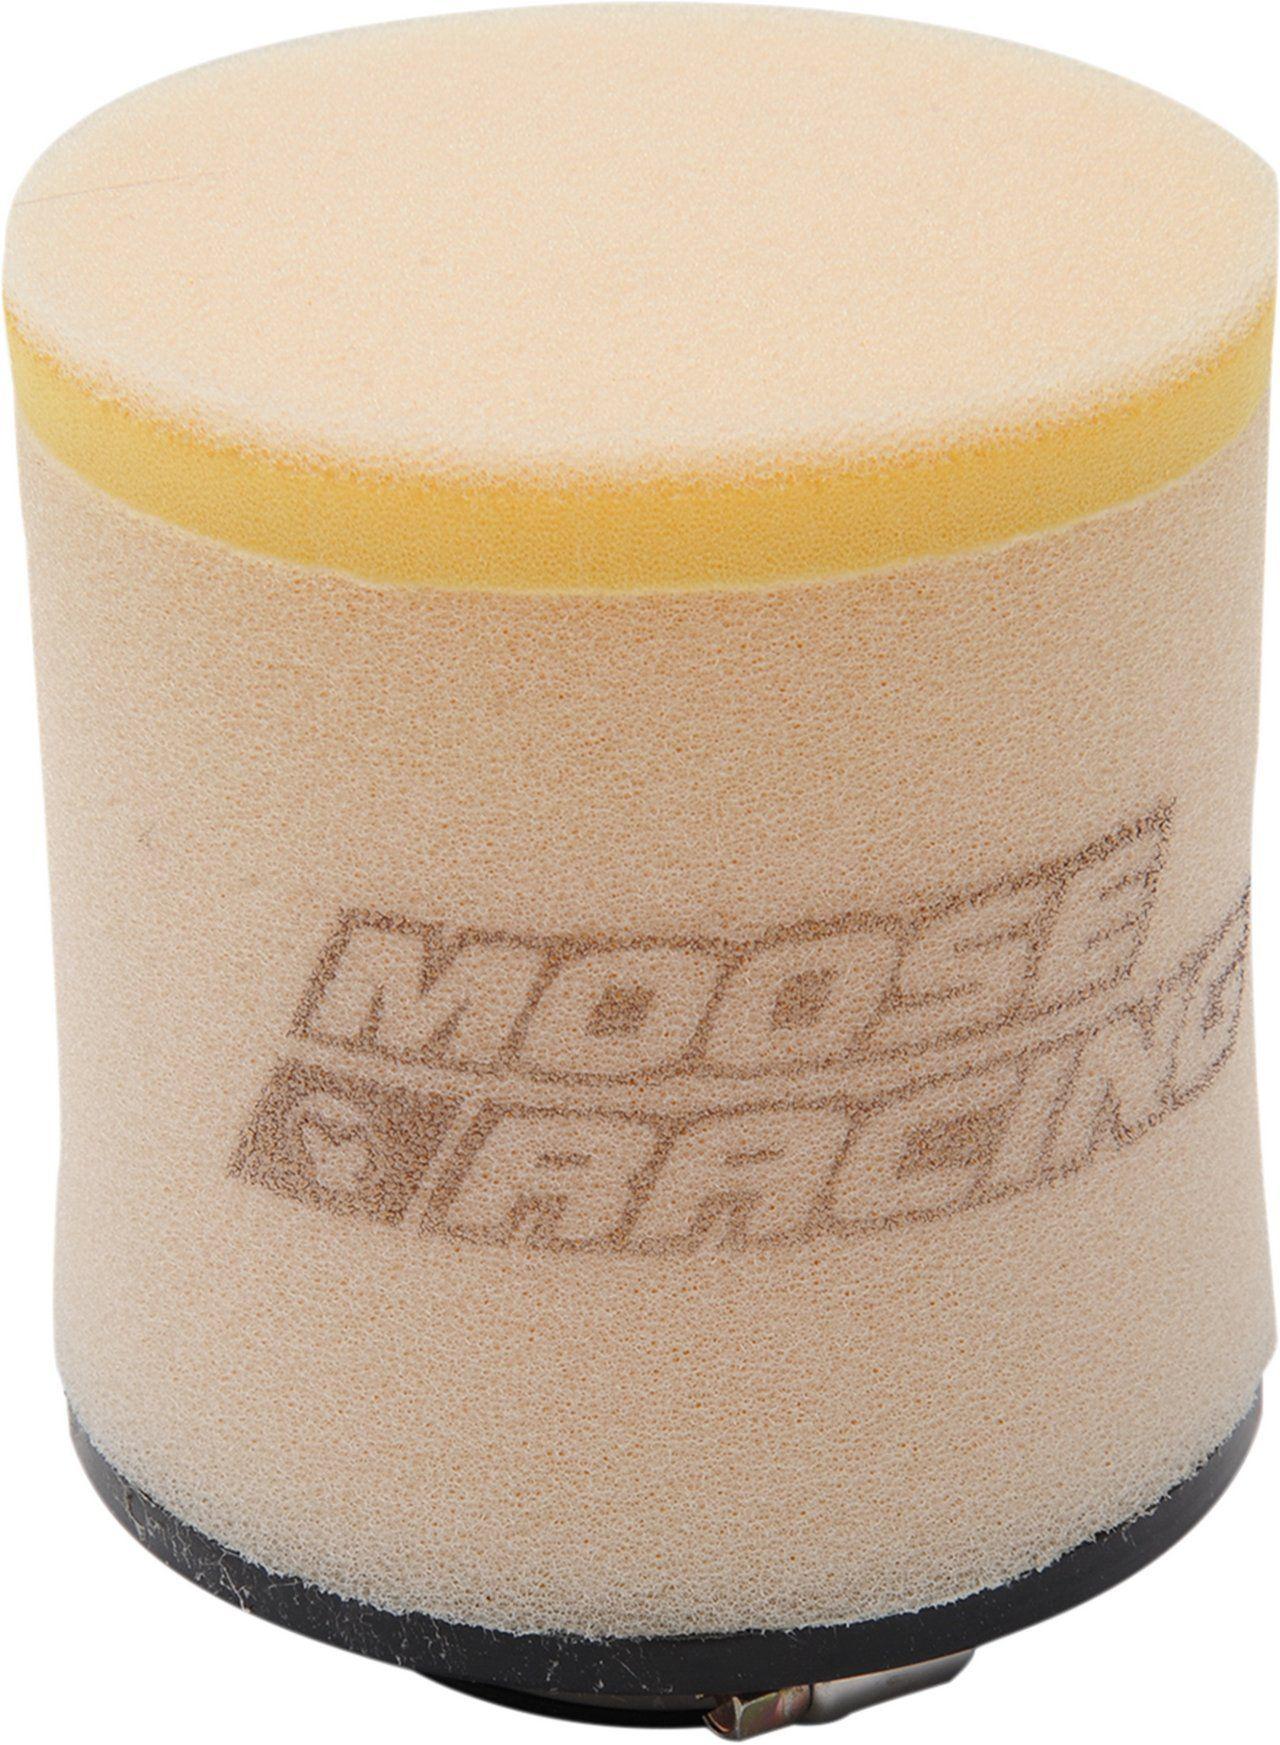 【MOOSE RACING】PPO (PRECISION PRE-OILED) 空氣濾芯 [1011-3711] - 「Webike-摩托百貨」